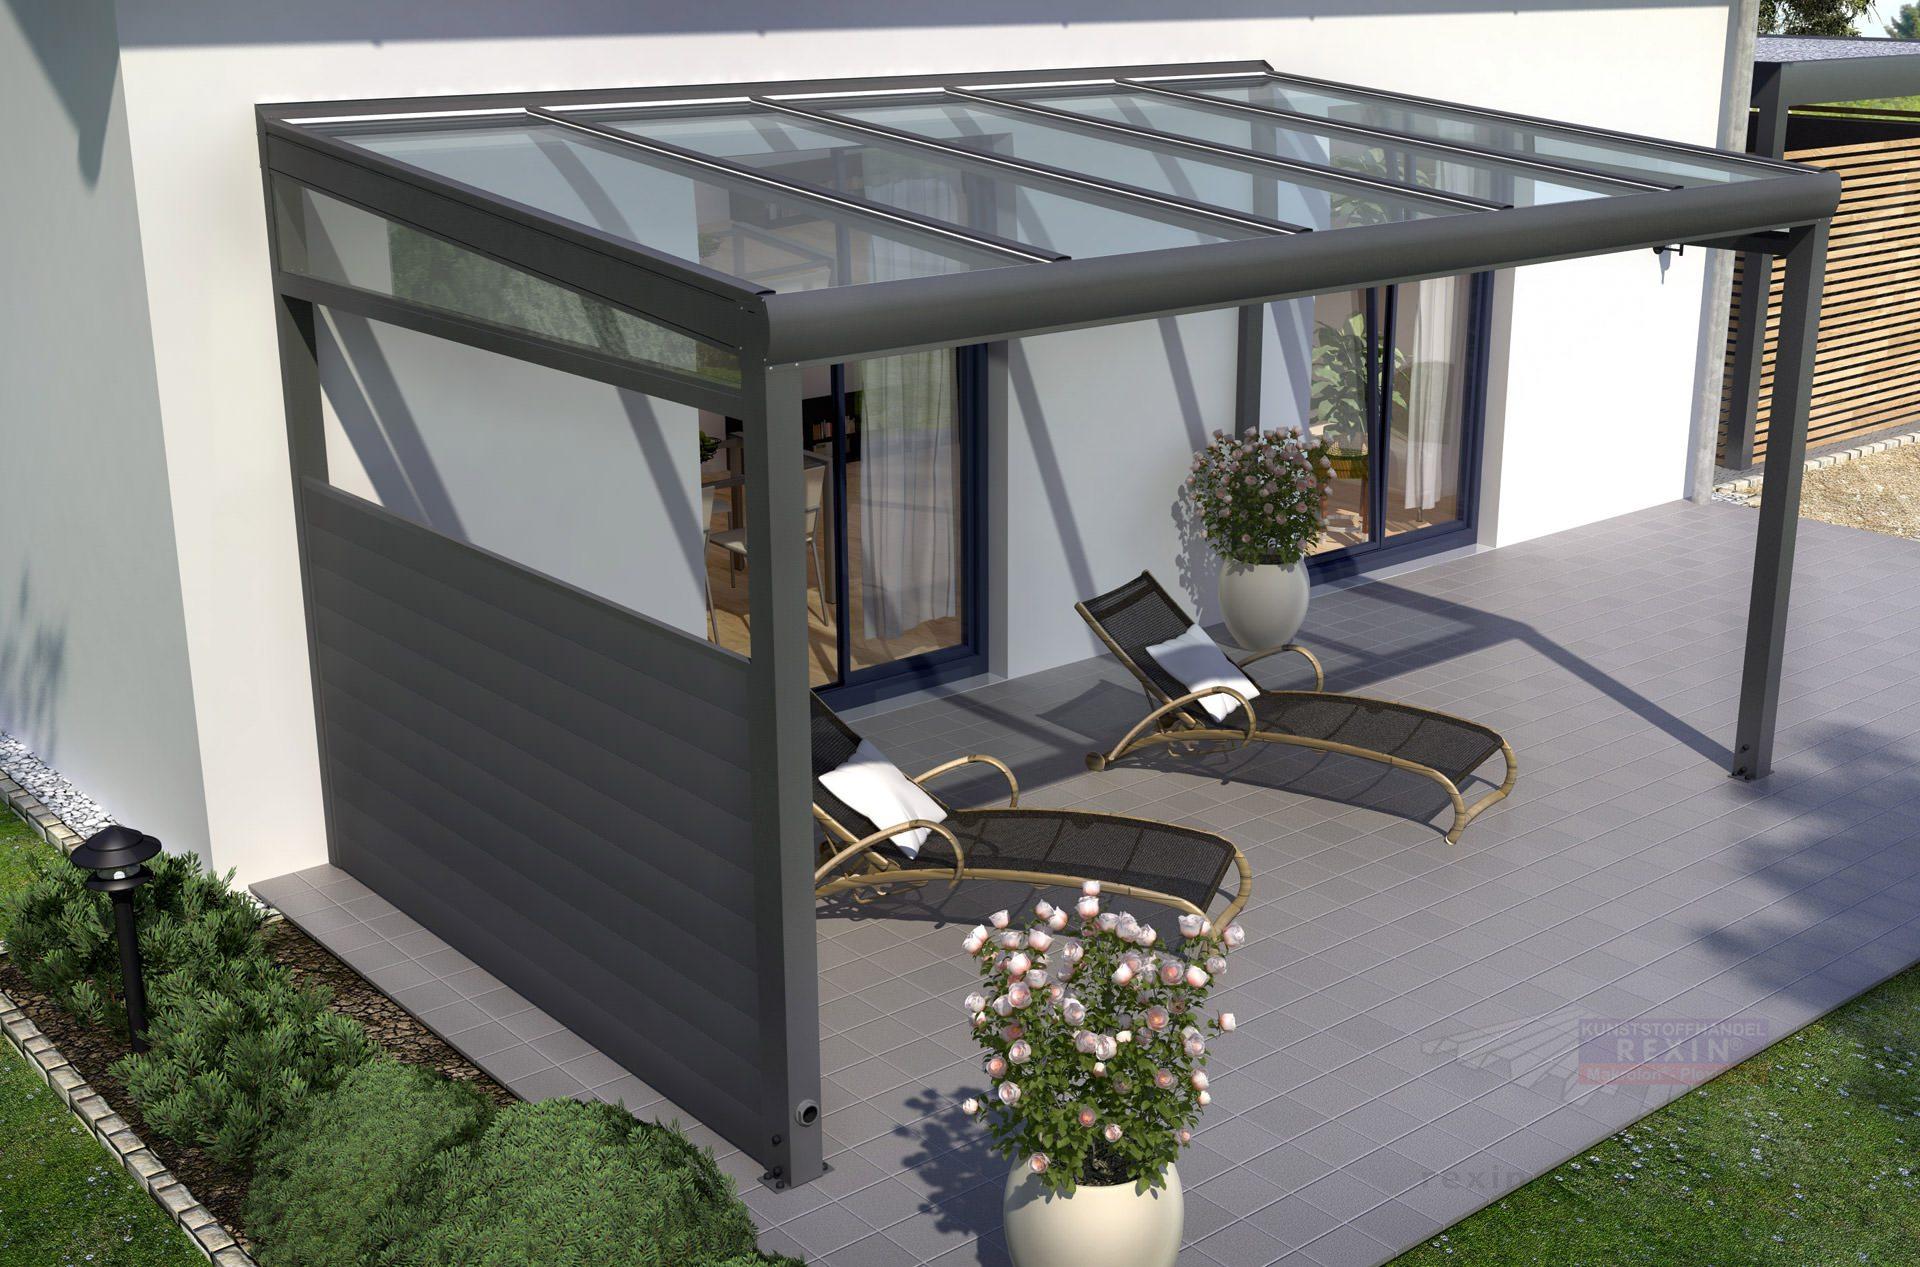 rexocover terrassen seitenwand 1 50m h he rexocover terrassen seitenwand 1 50m h he rexin shop. Black Bedroom Furniture Sets. Home Design Ideas